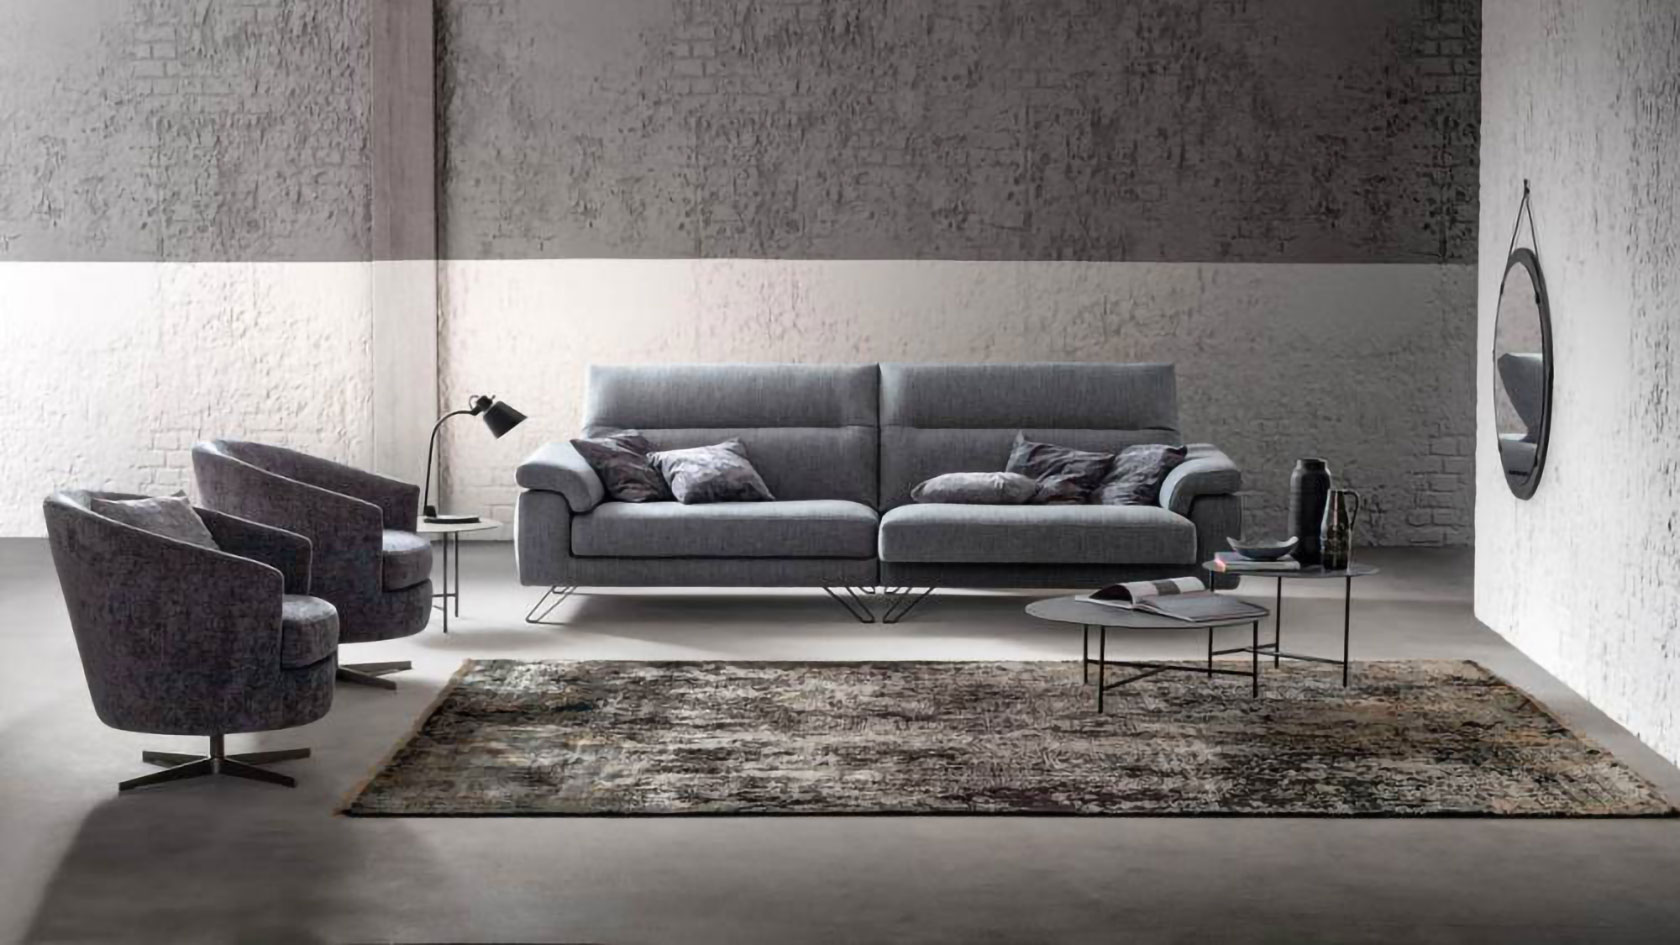 Logica d'arredo - samoa - divani moderni - way special